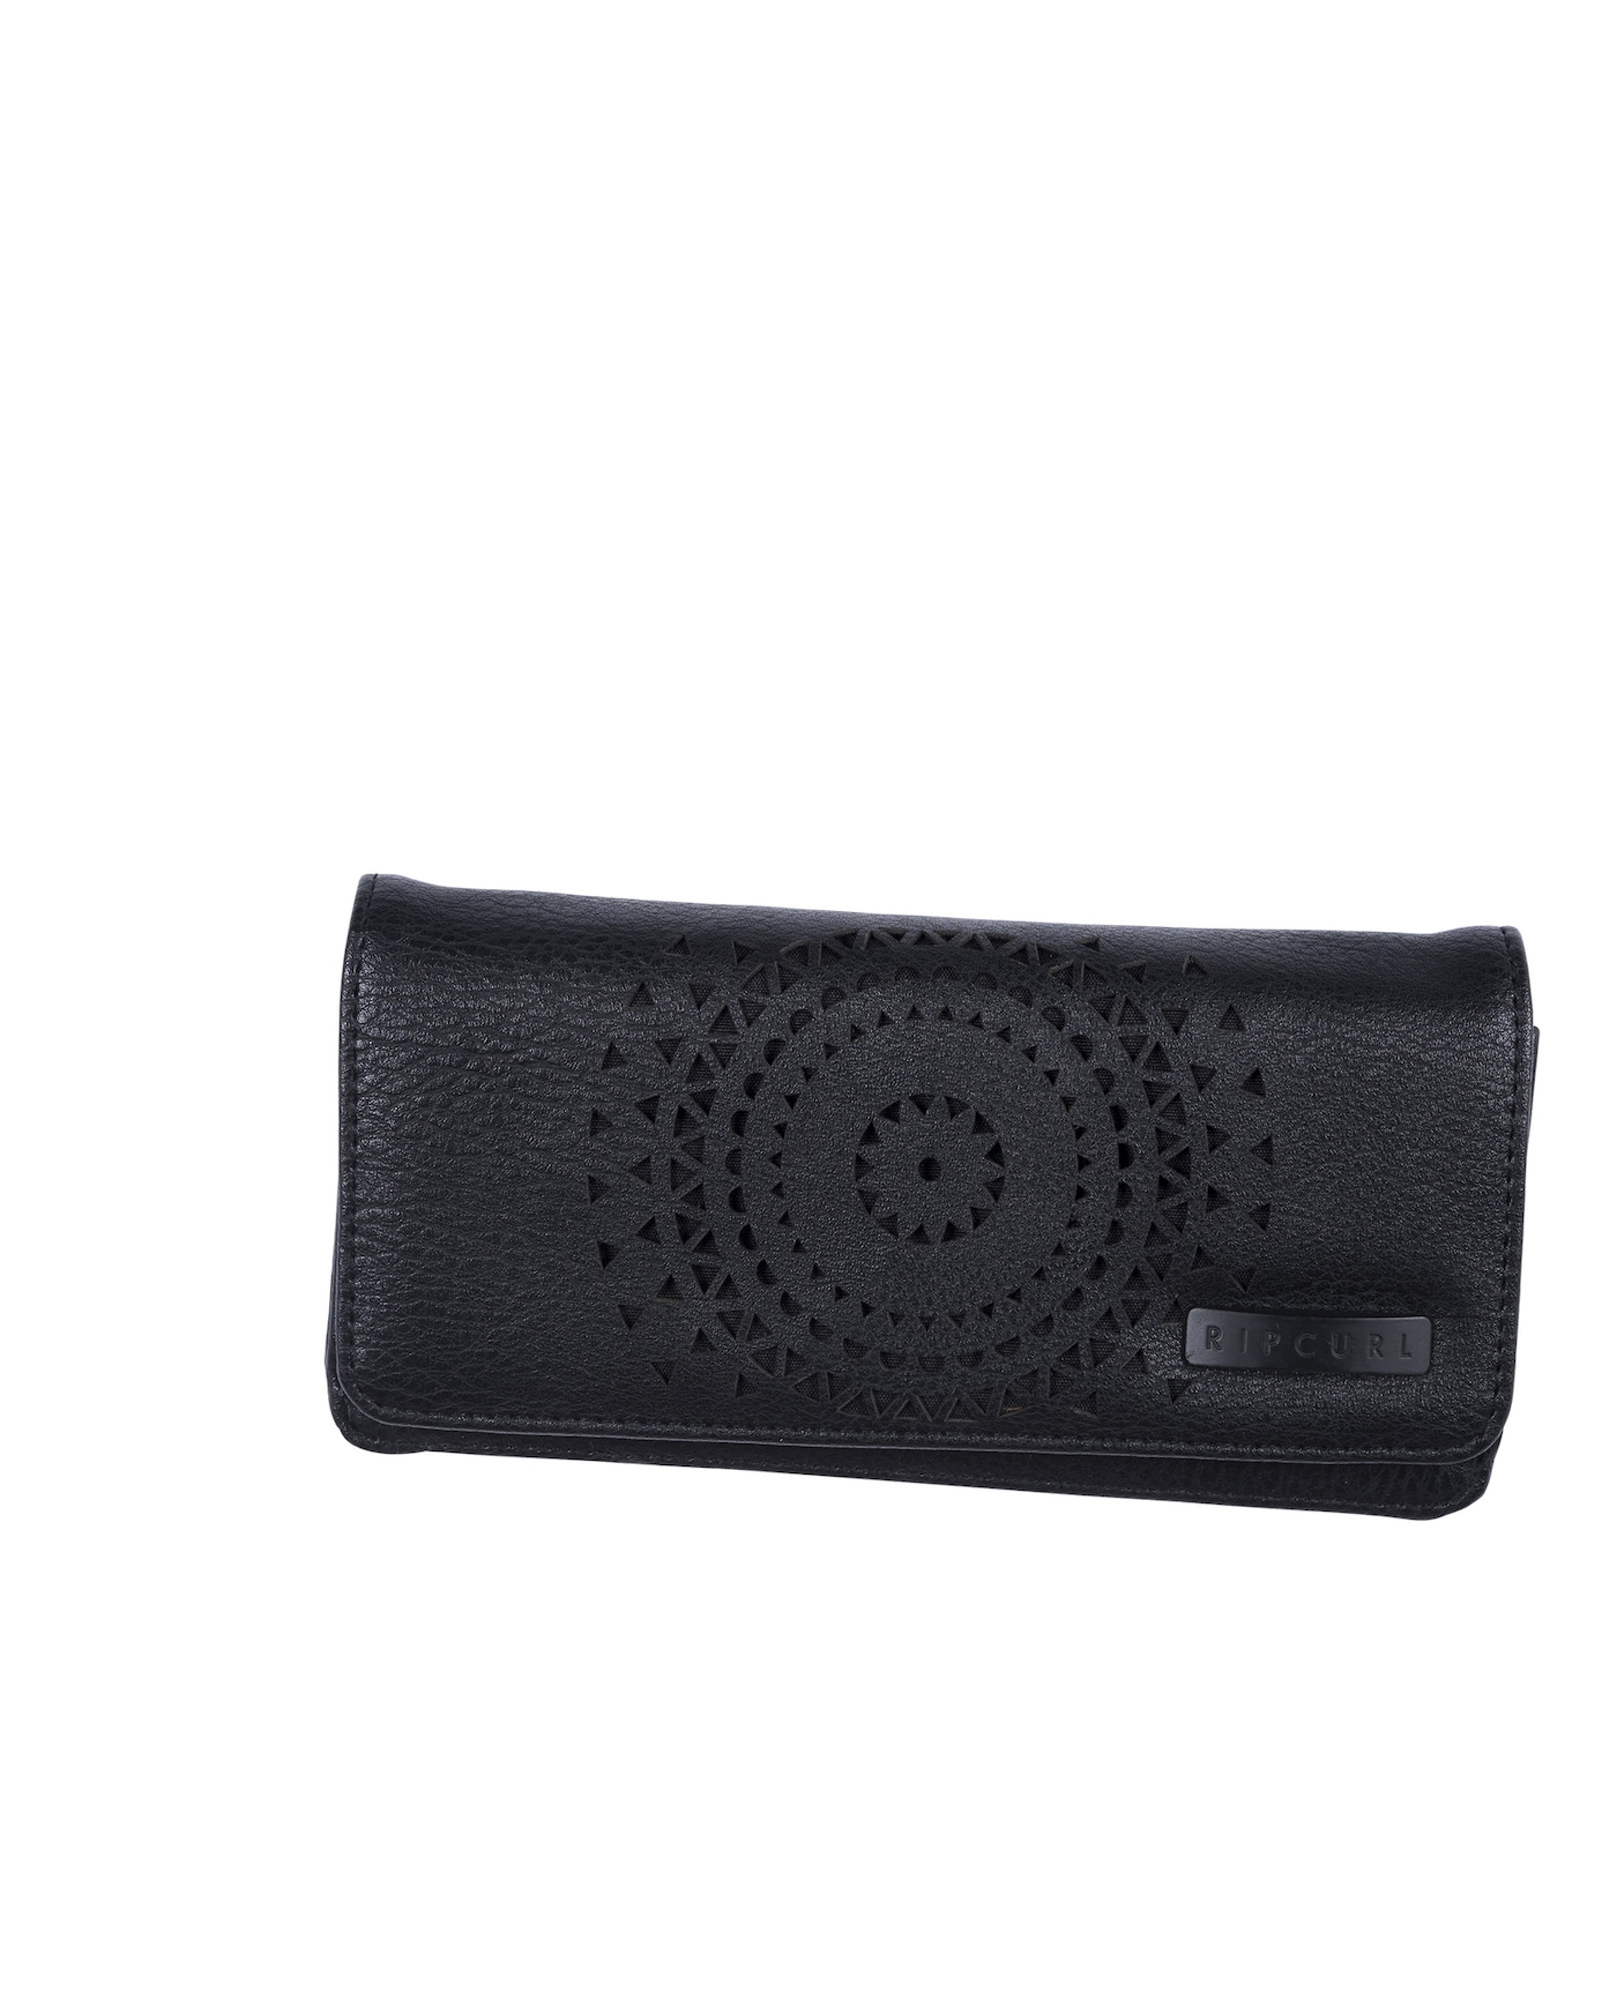 Peňaženka dámska Rip Curl Wallets Leilani RFID MID LEATHER